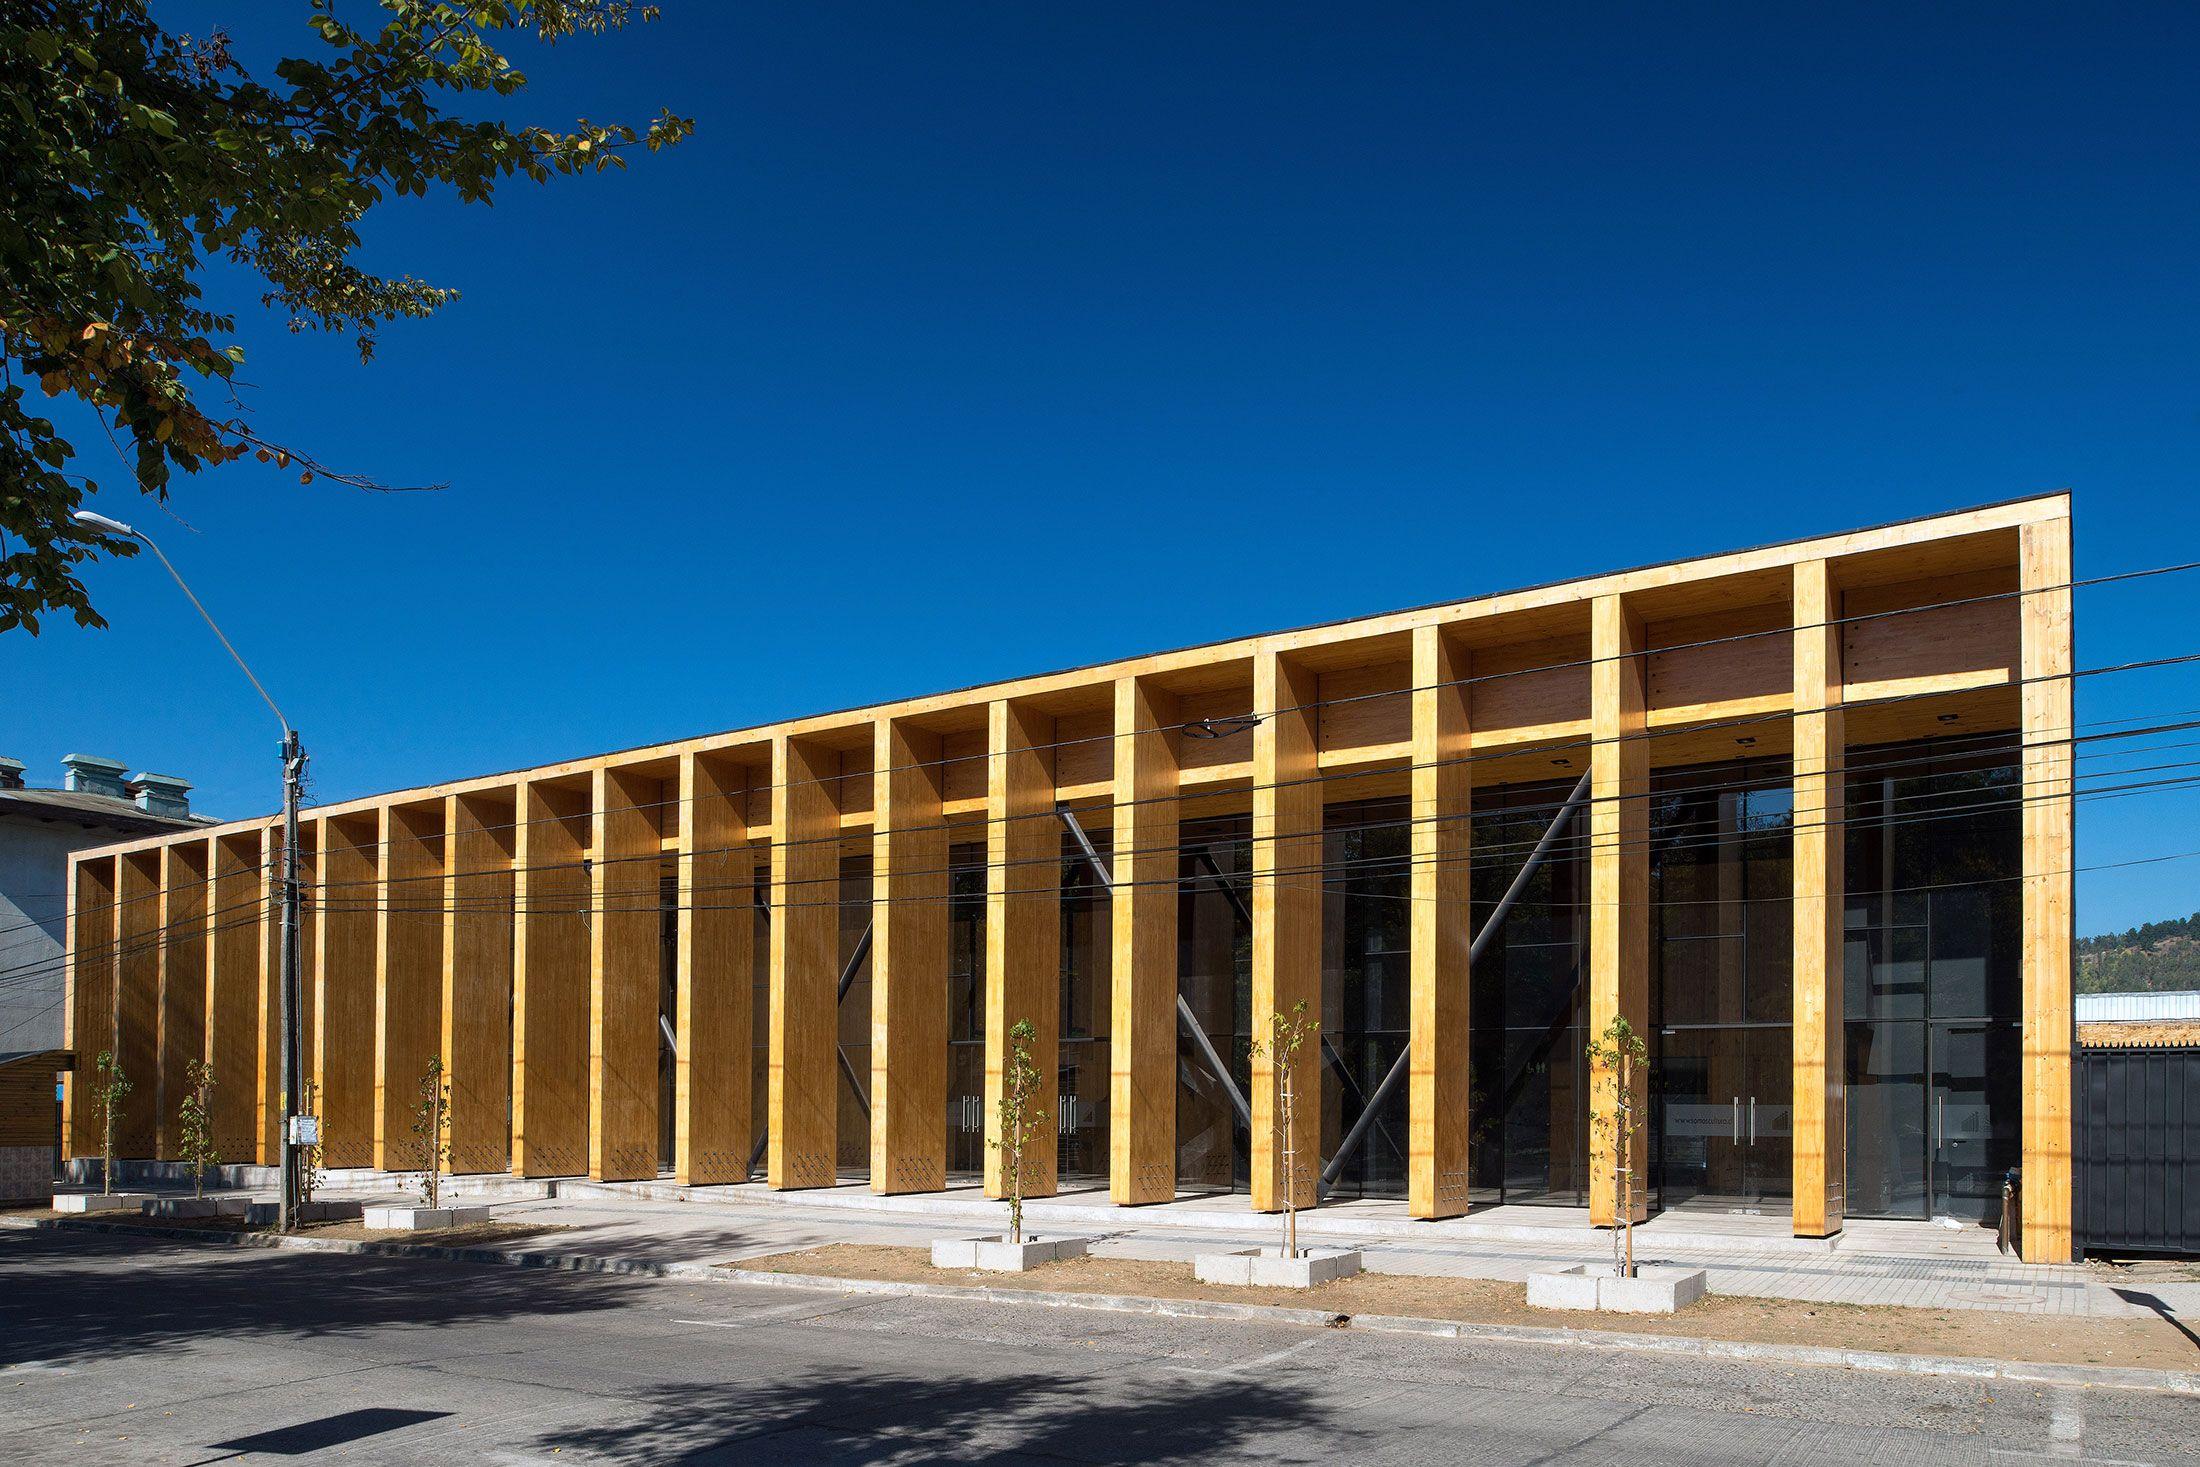 Alejandro Aravena Con Imagenes Colegios Arquitectura